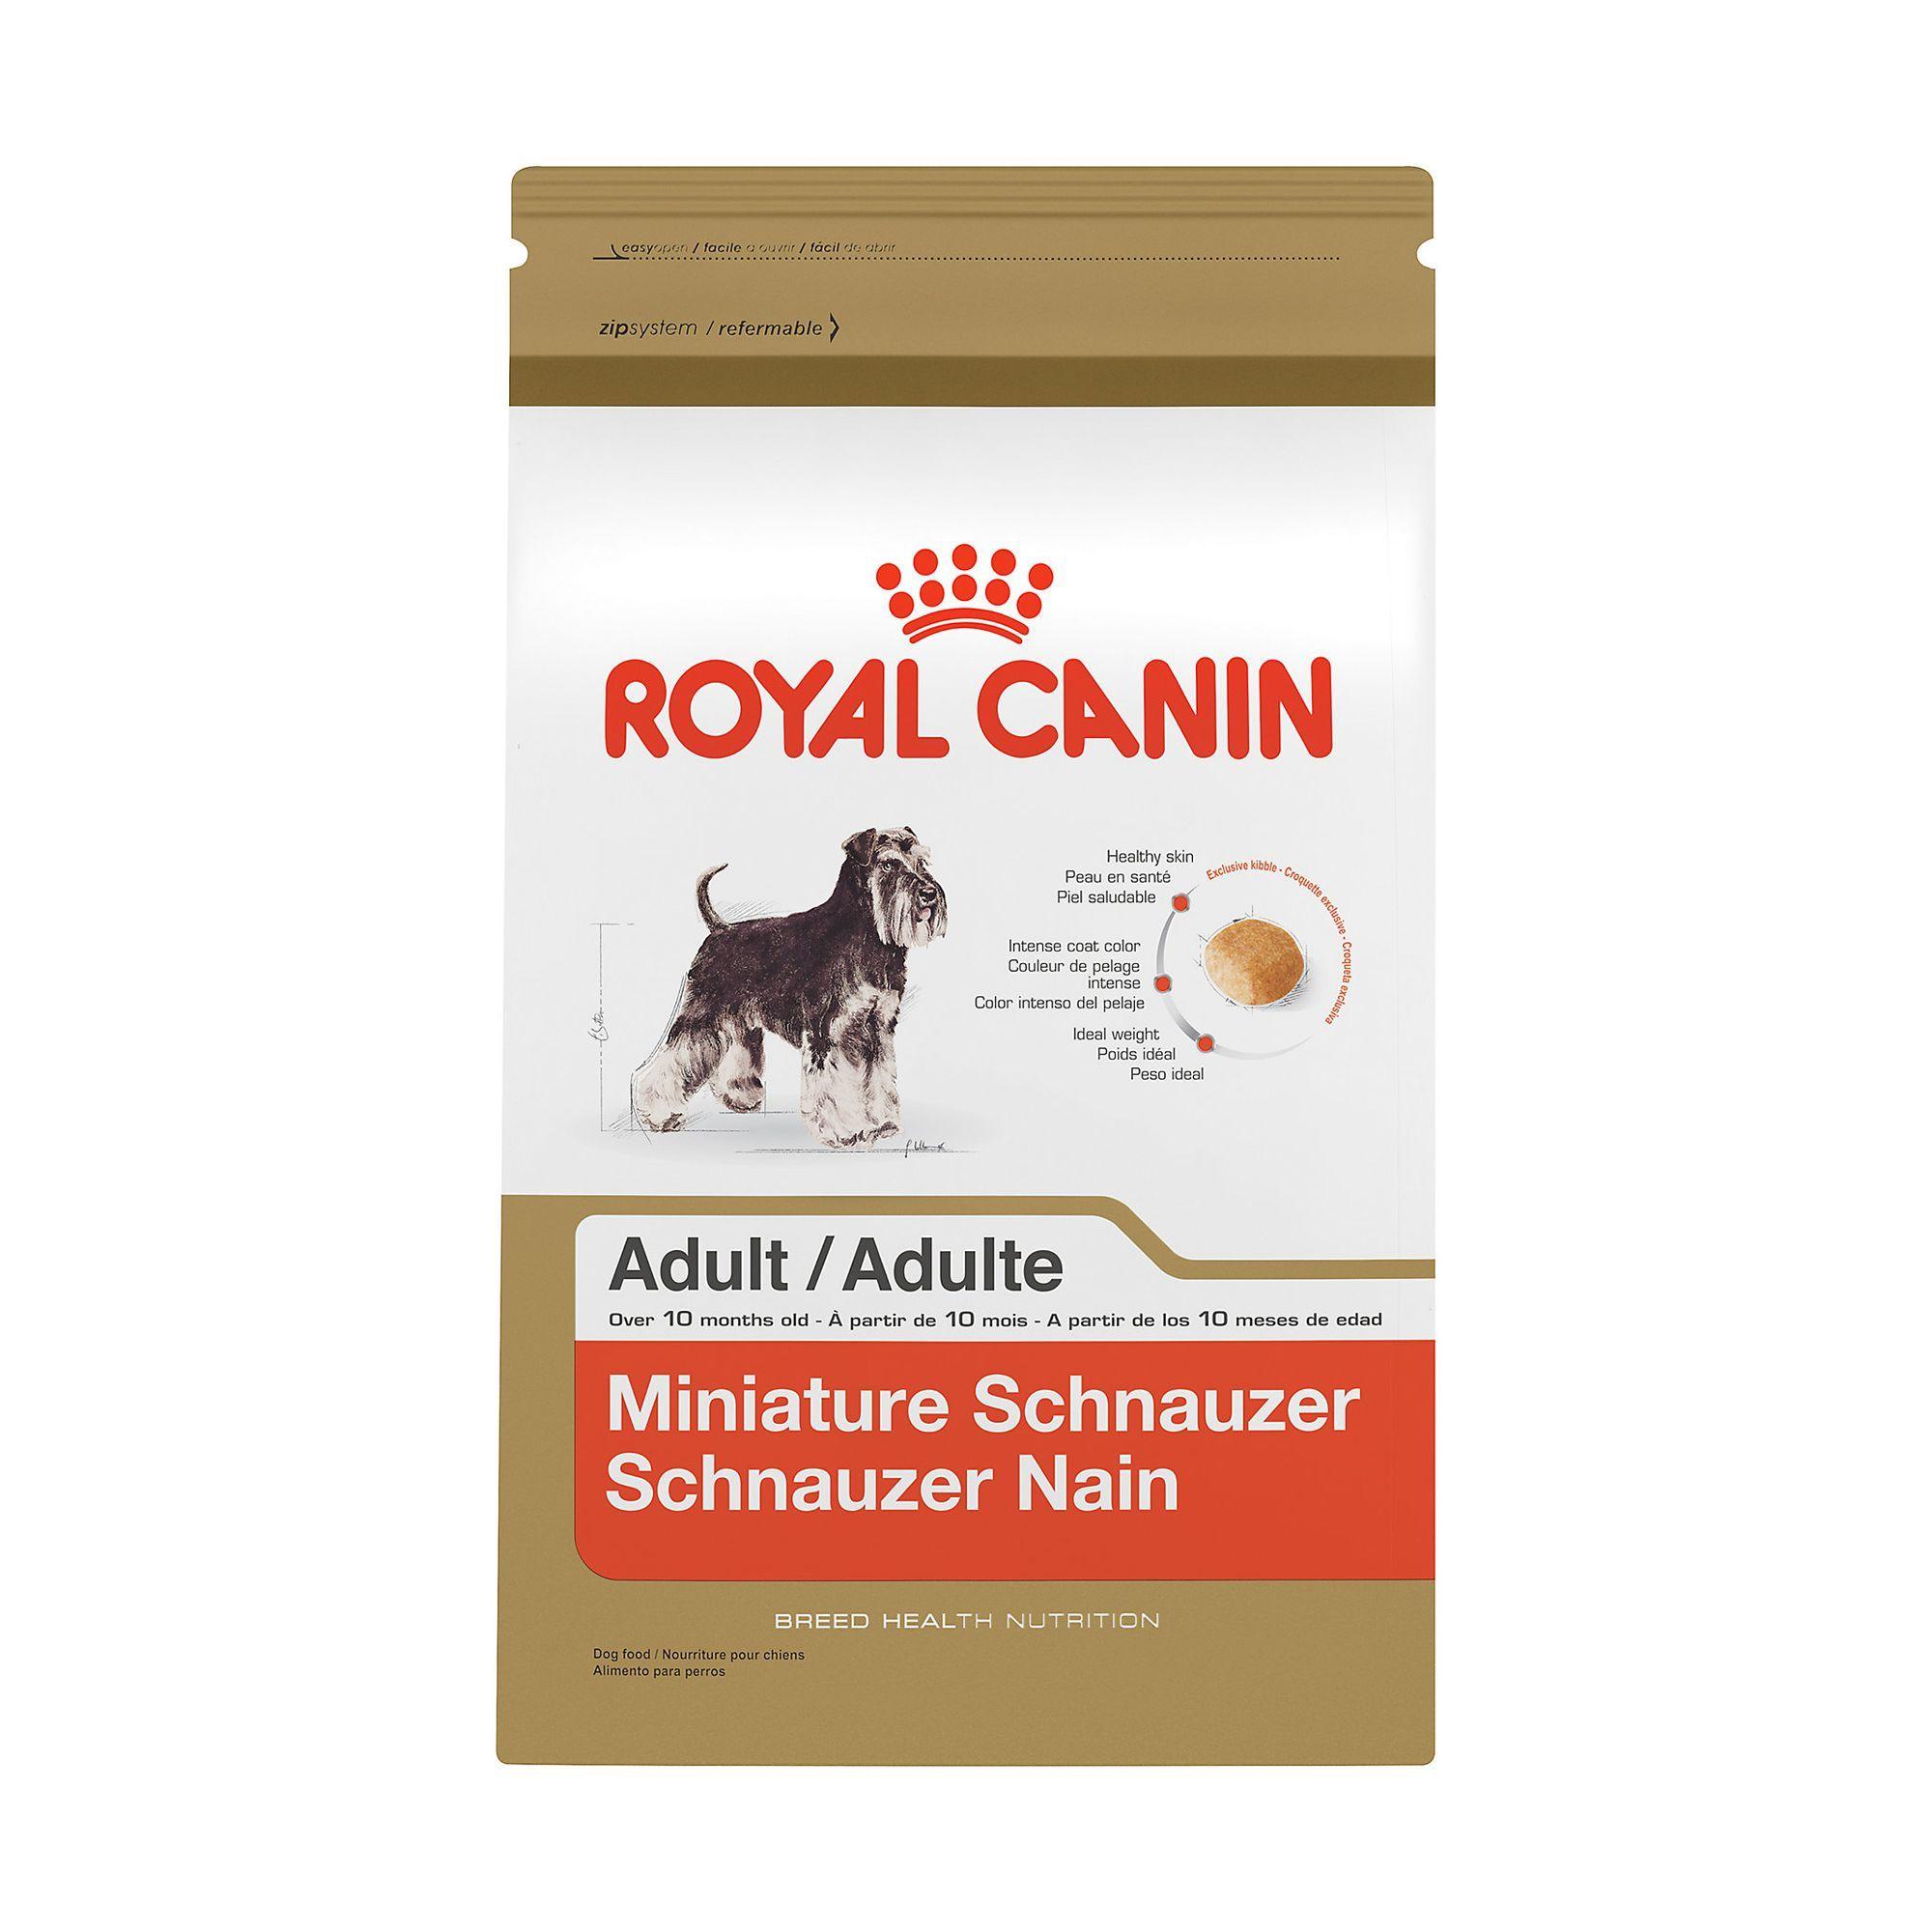 Royal Canin Breed Health Nutrition Miniature Schnauzer Adult Dog